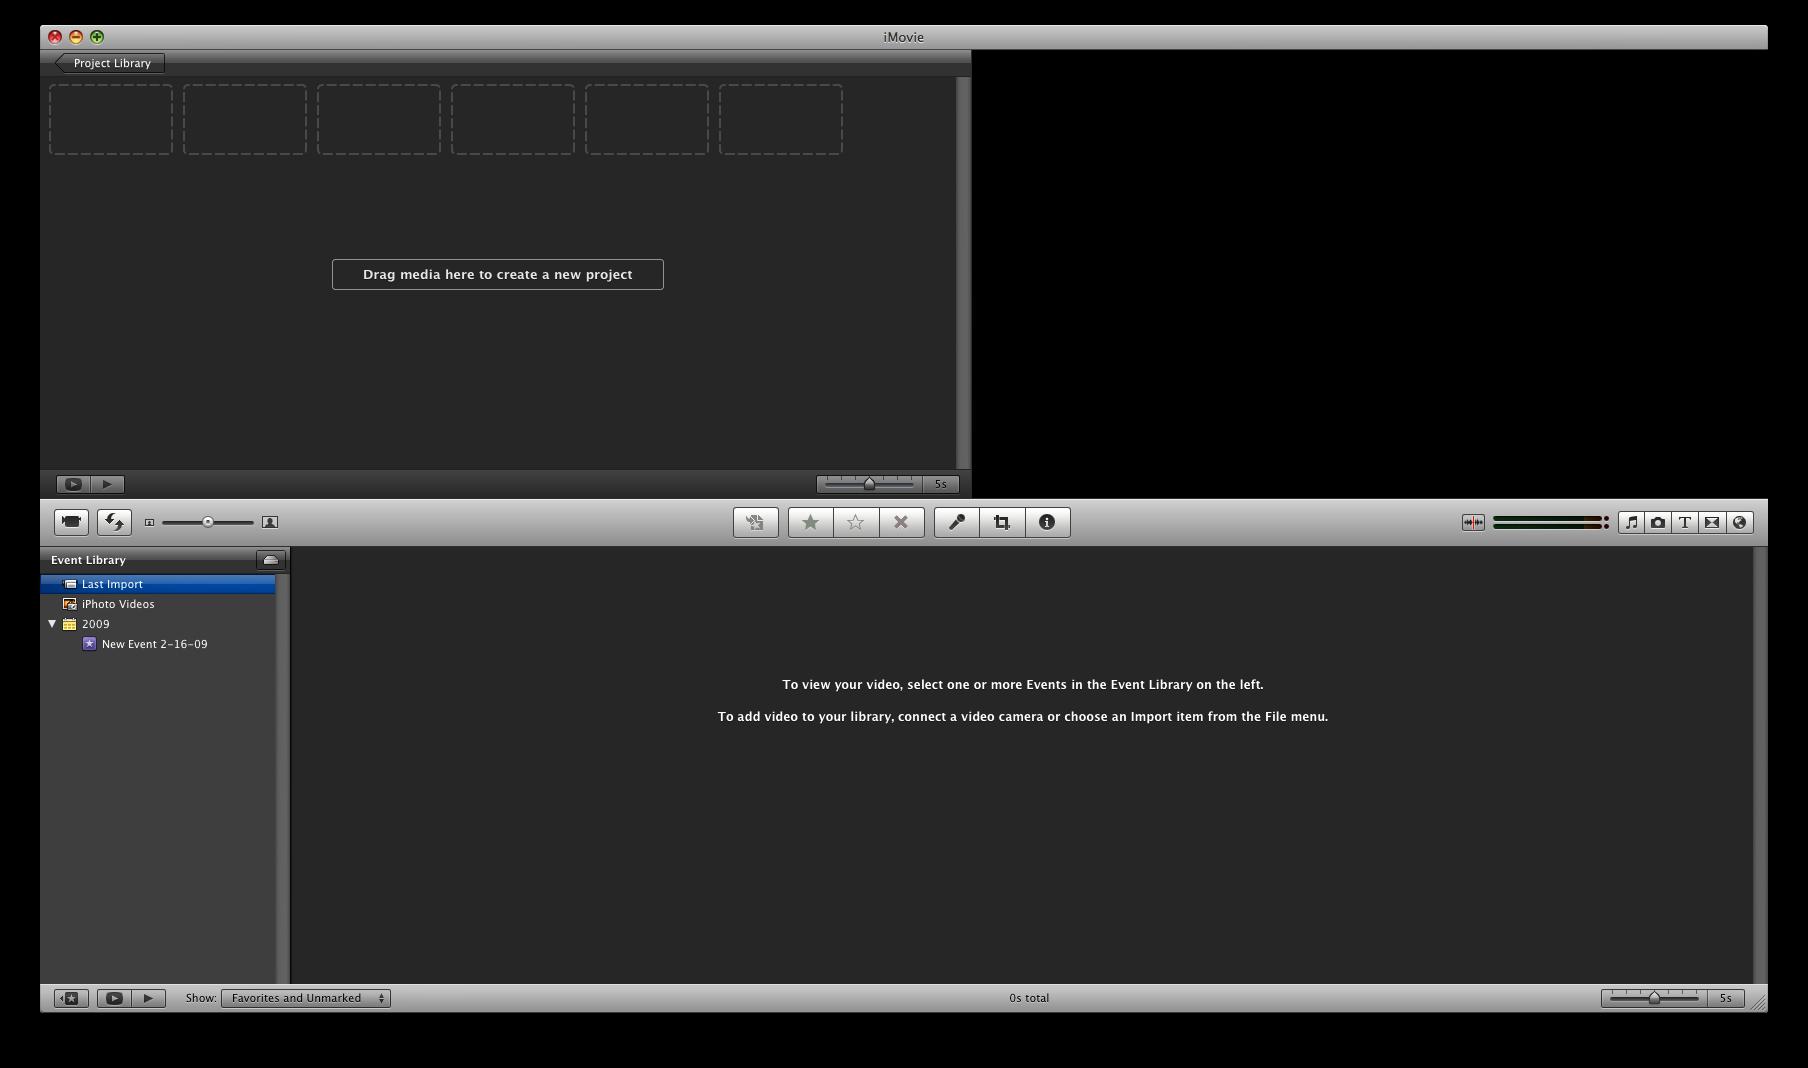 iMovie 8: Blank Slate